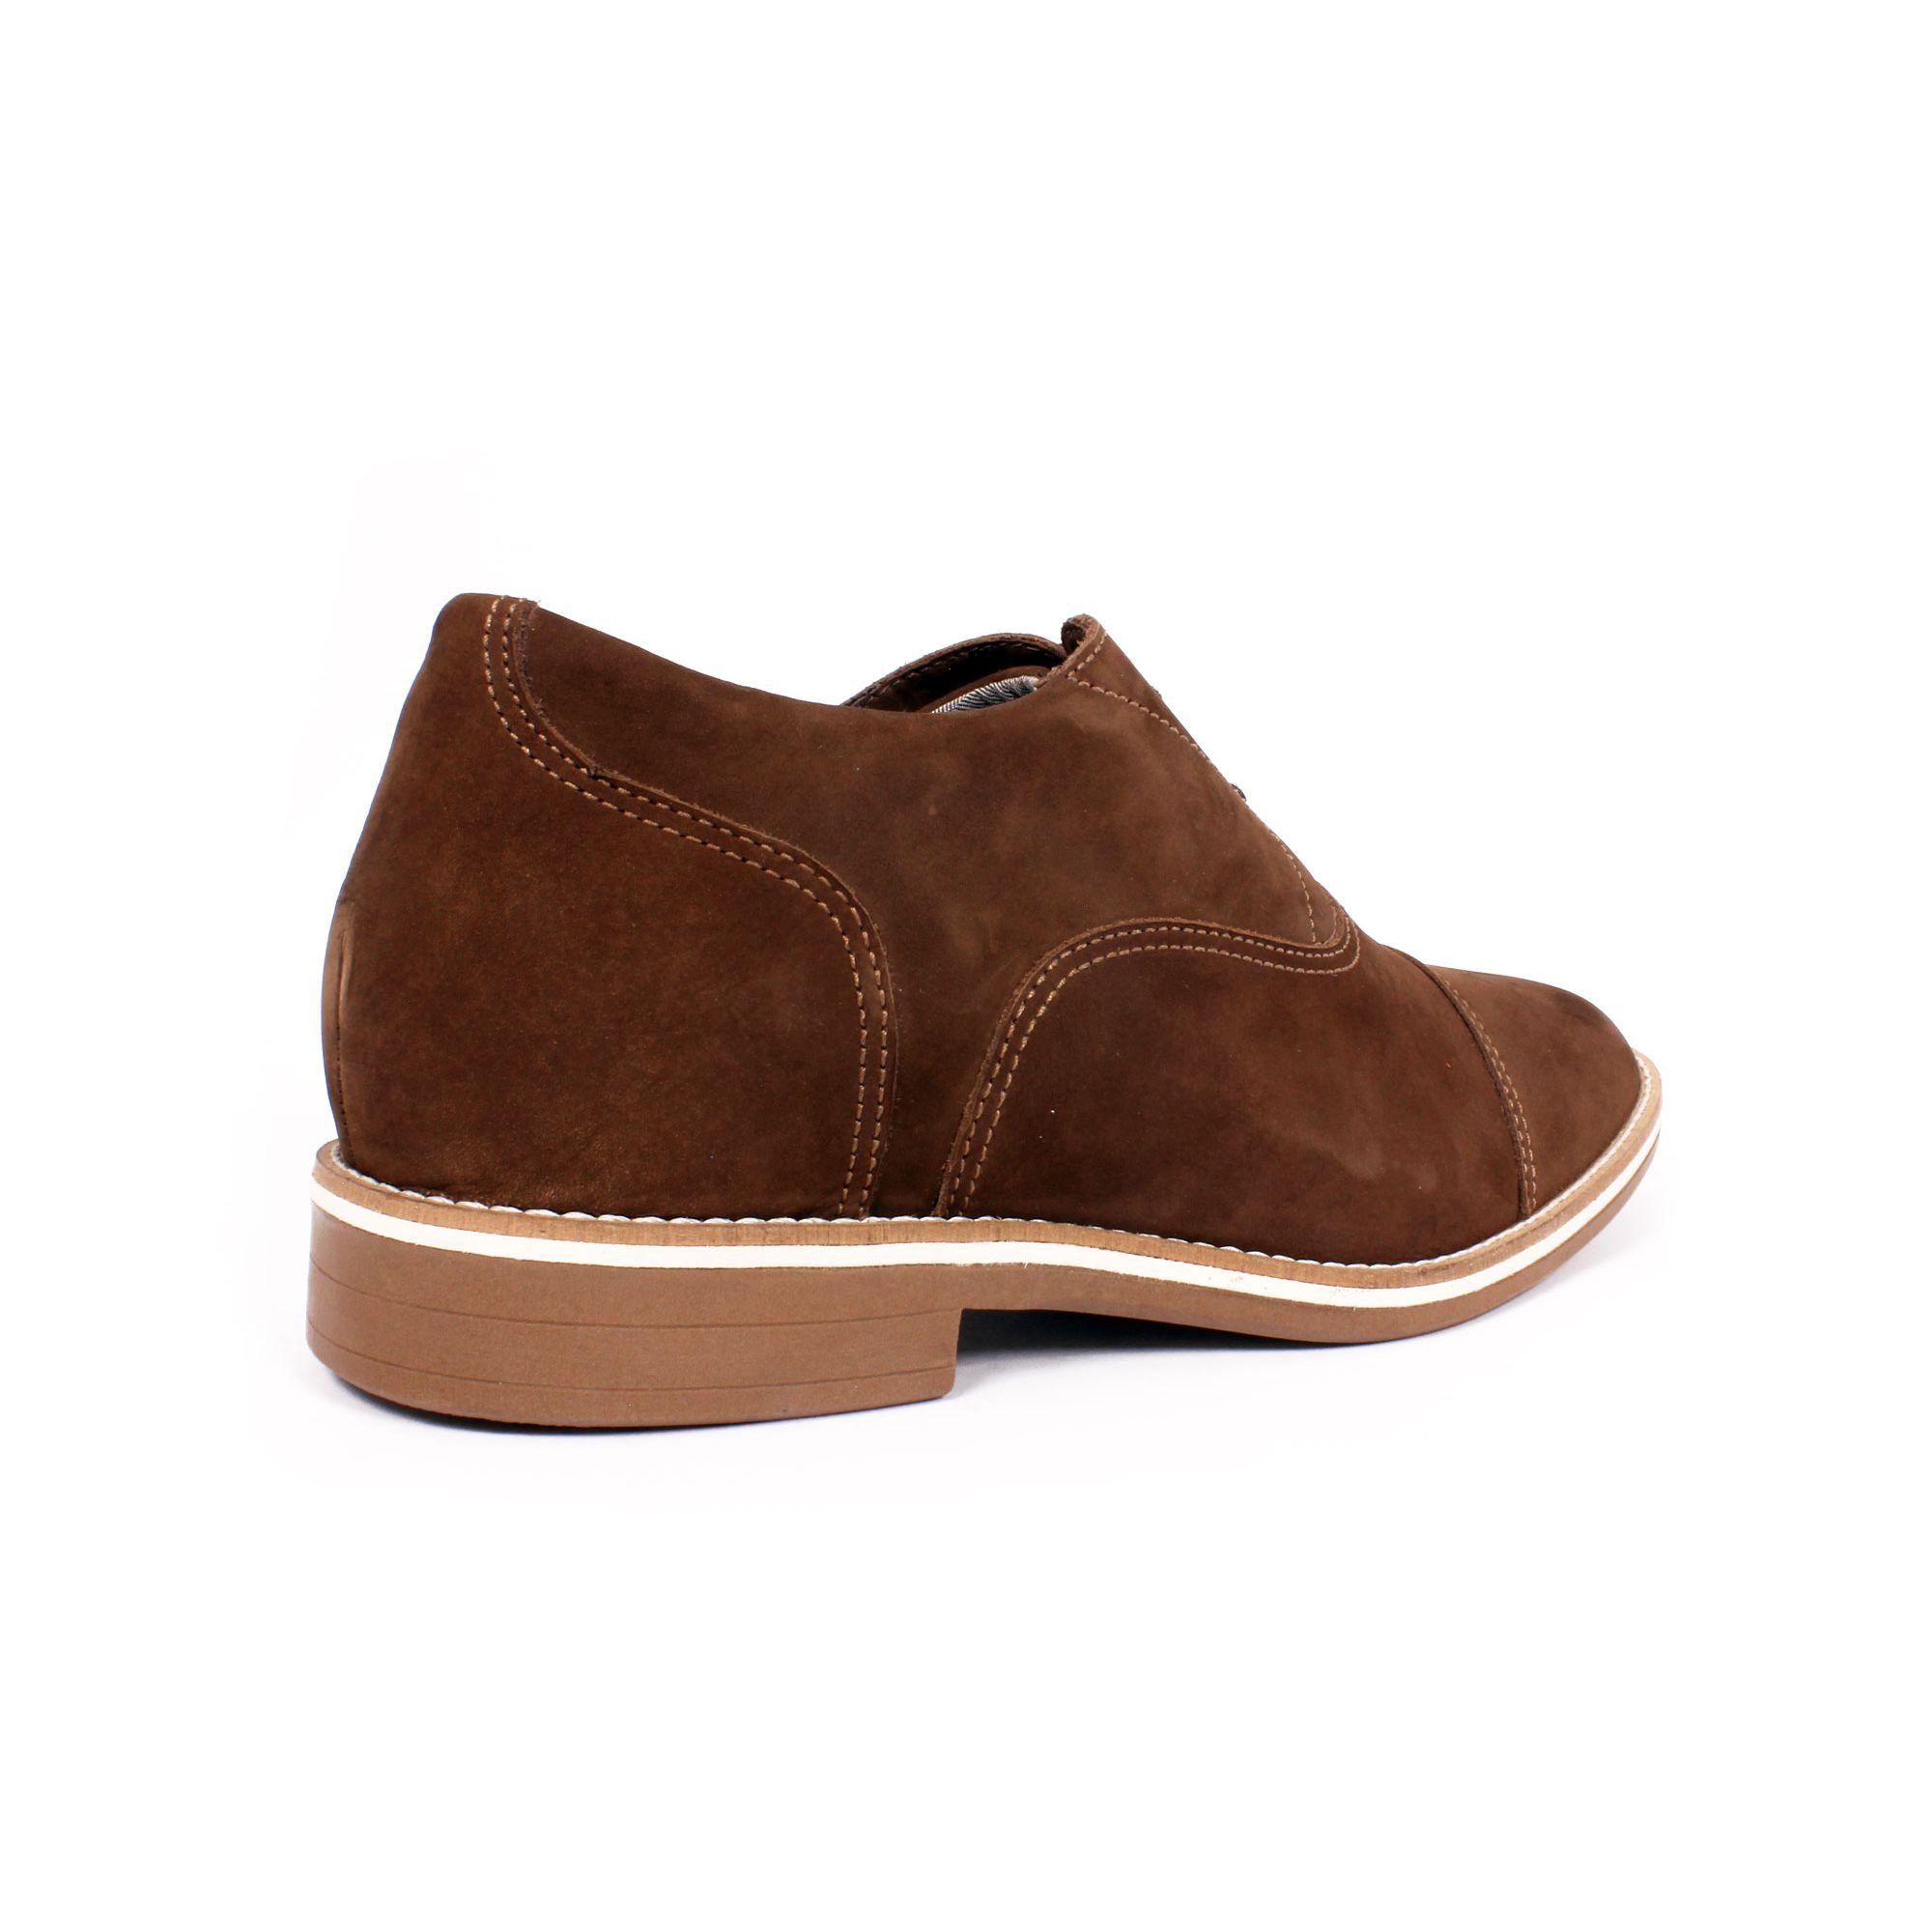 Zapato Casual Hippie Café Max Denegri +7cm de Altura_70872